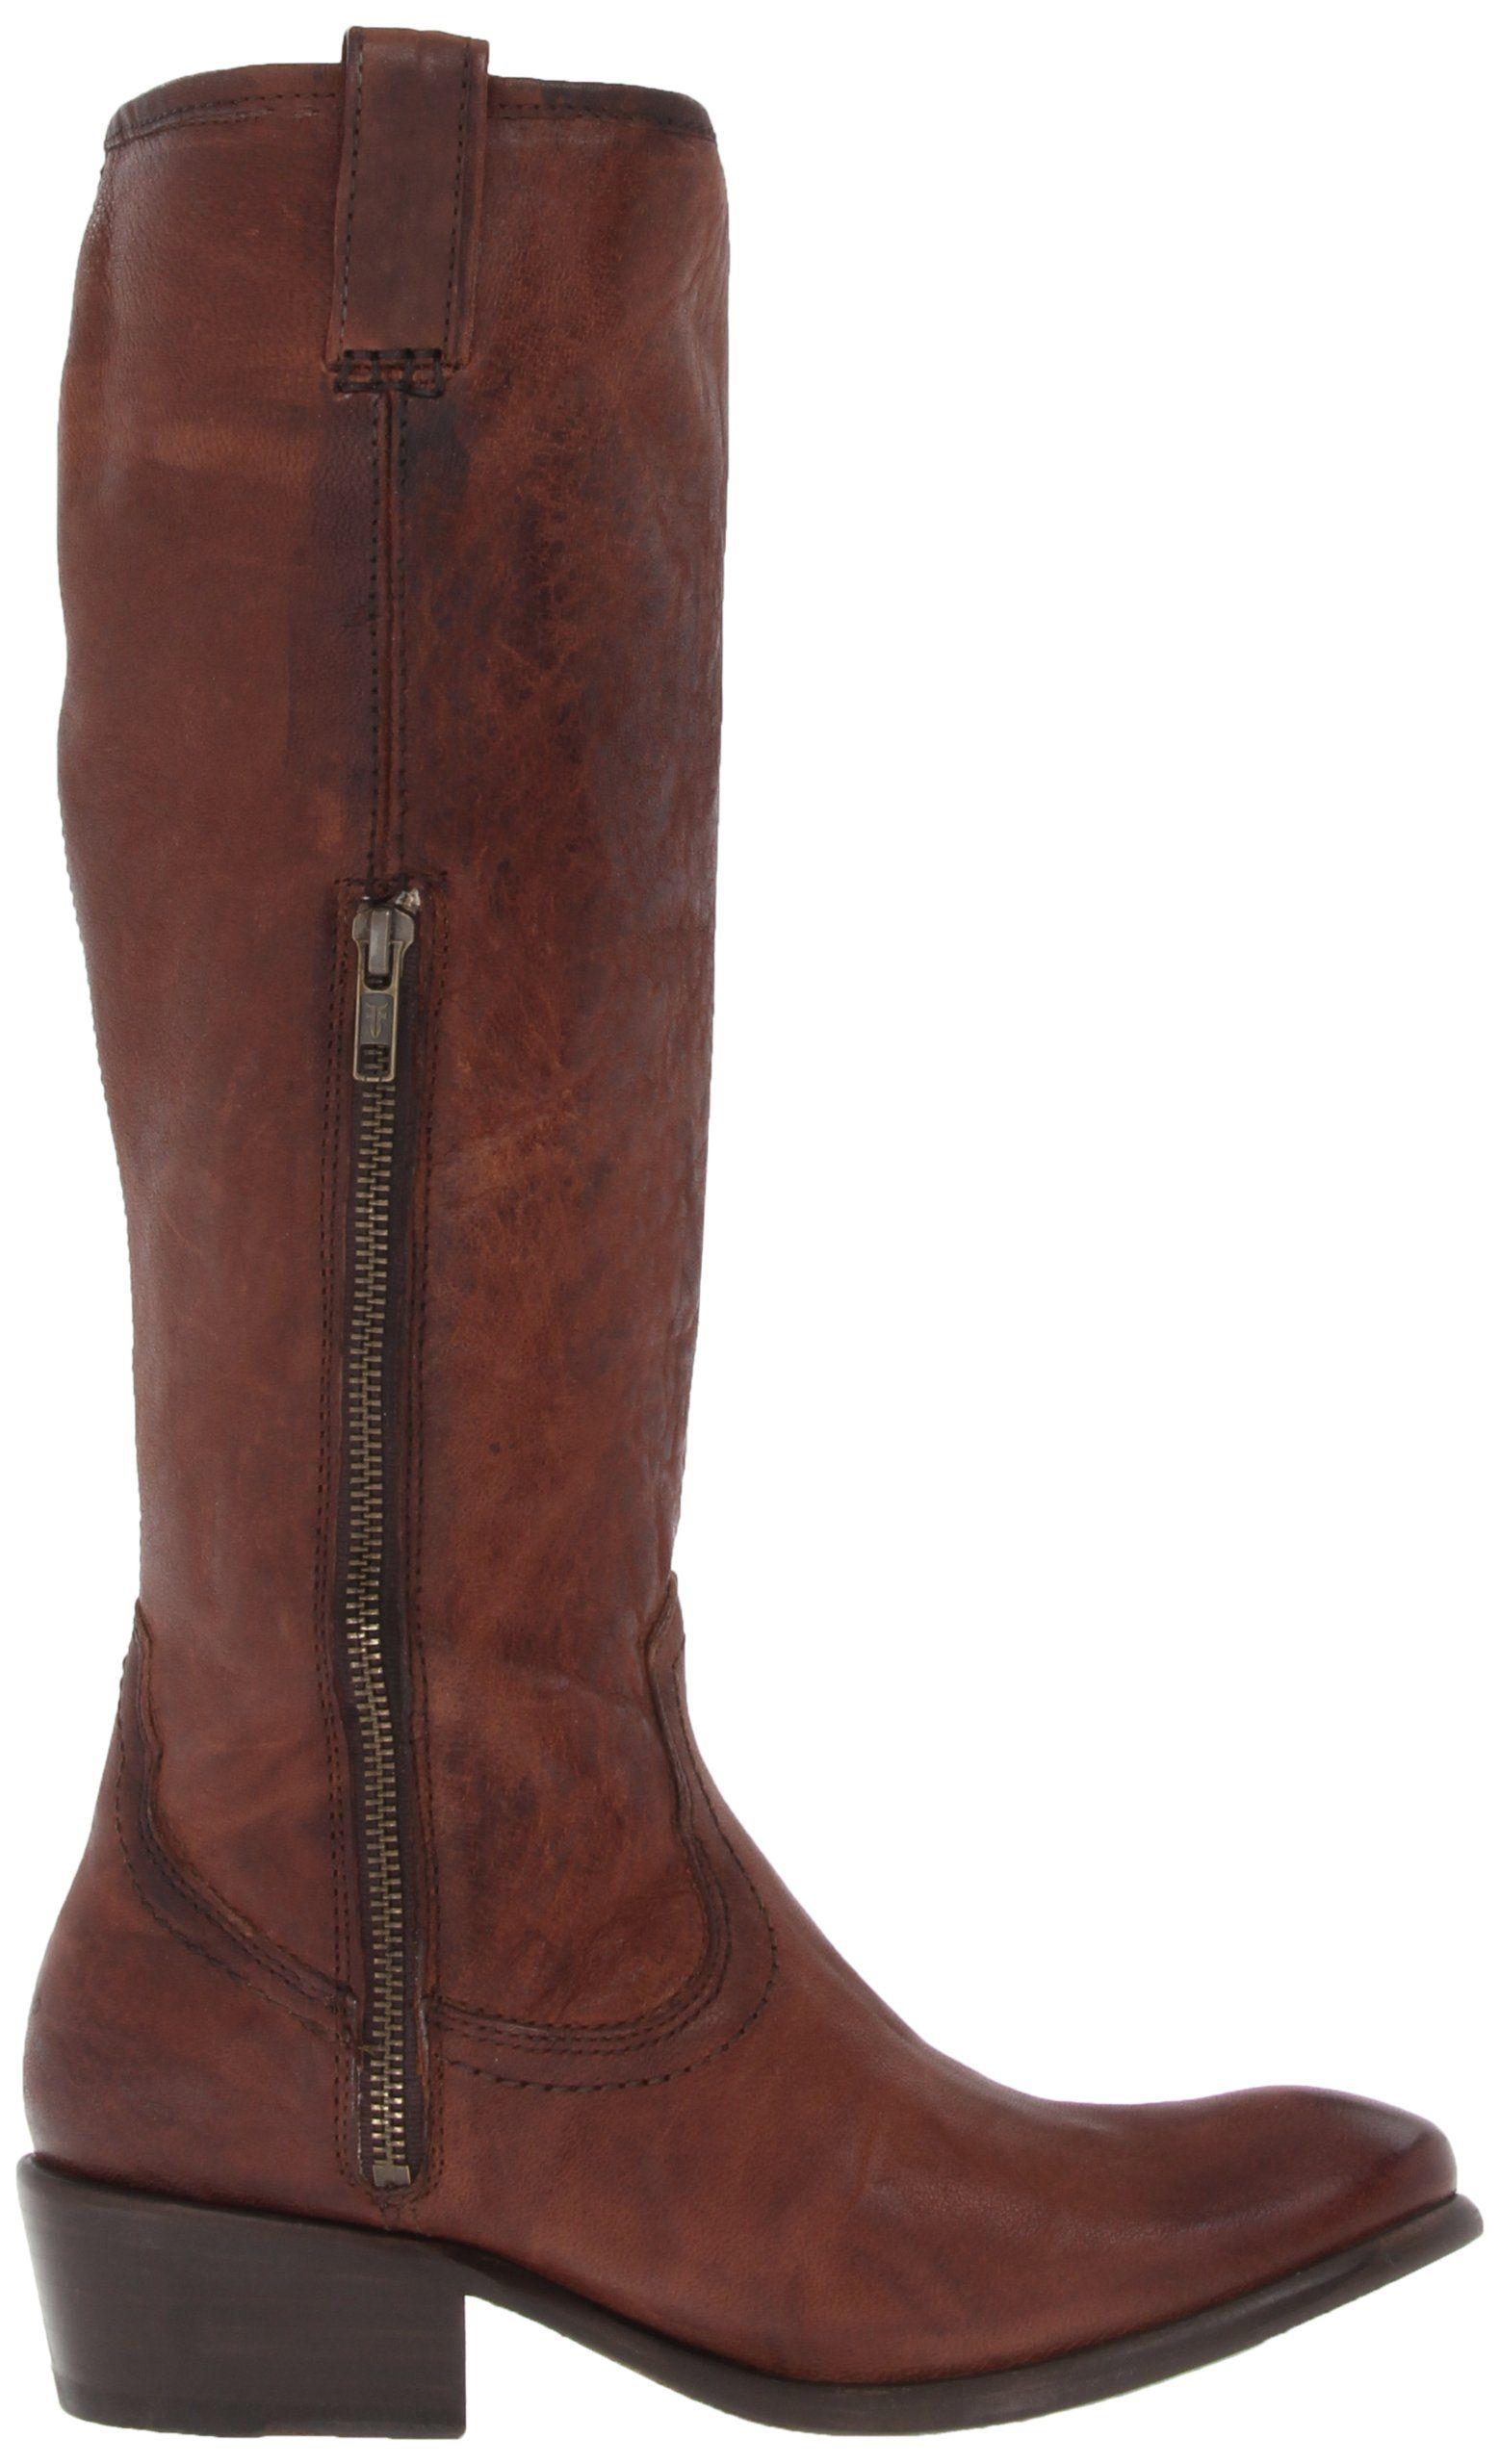 48c9c3b7ca6 Amazon.com: FRYE Women's Carson Zip Tall Boot: Clothing | Buy the ...